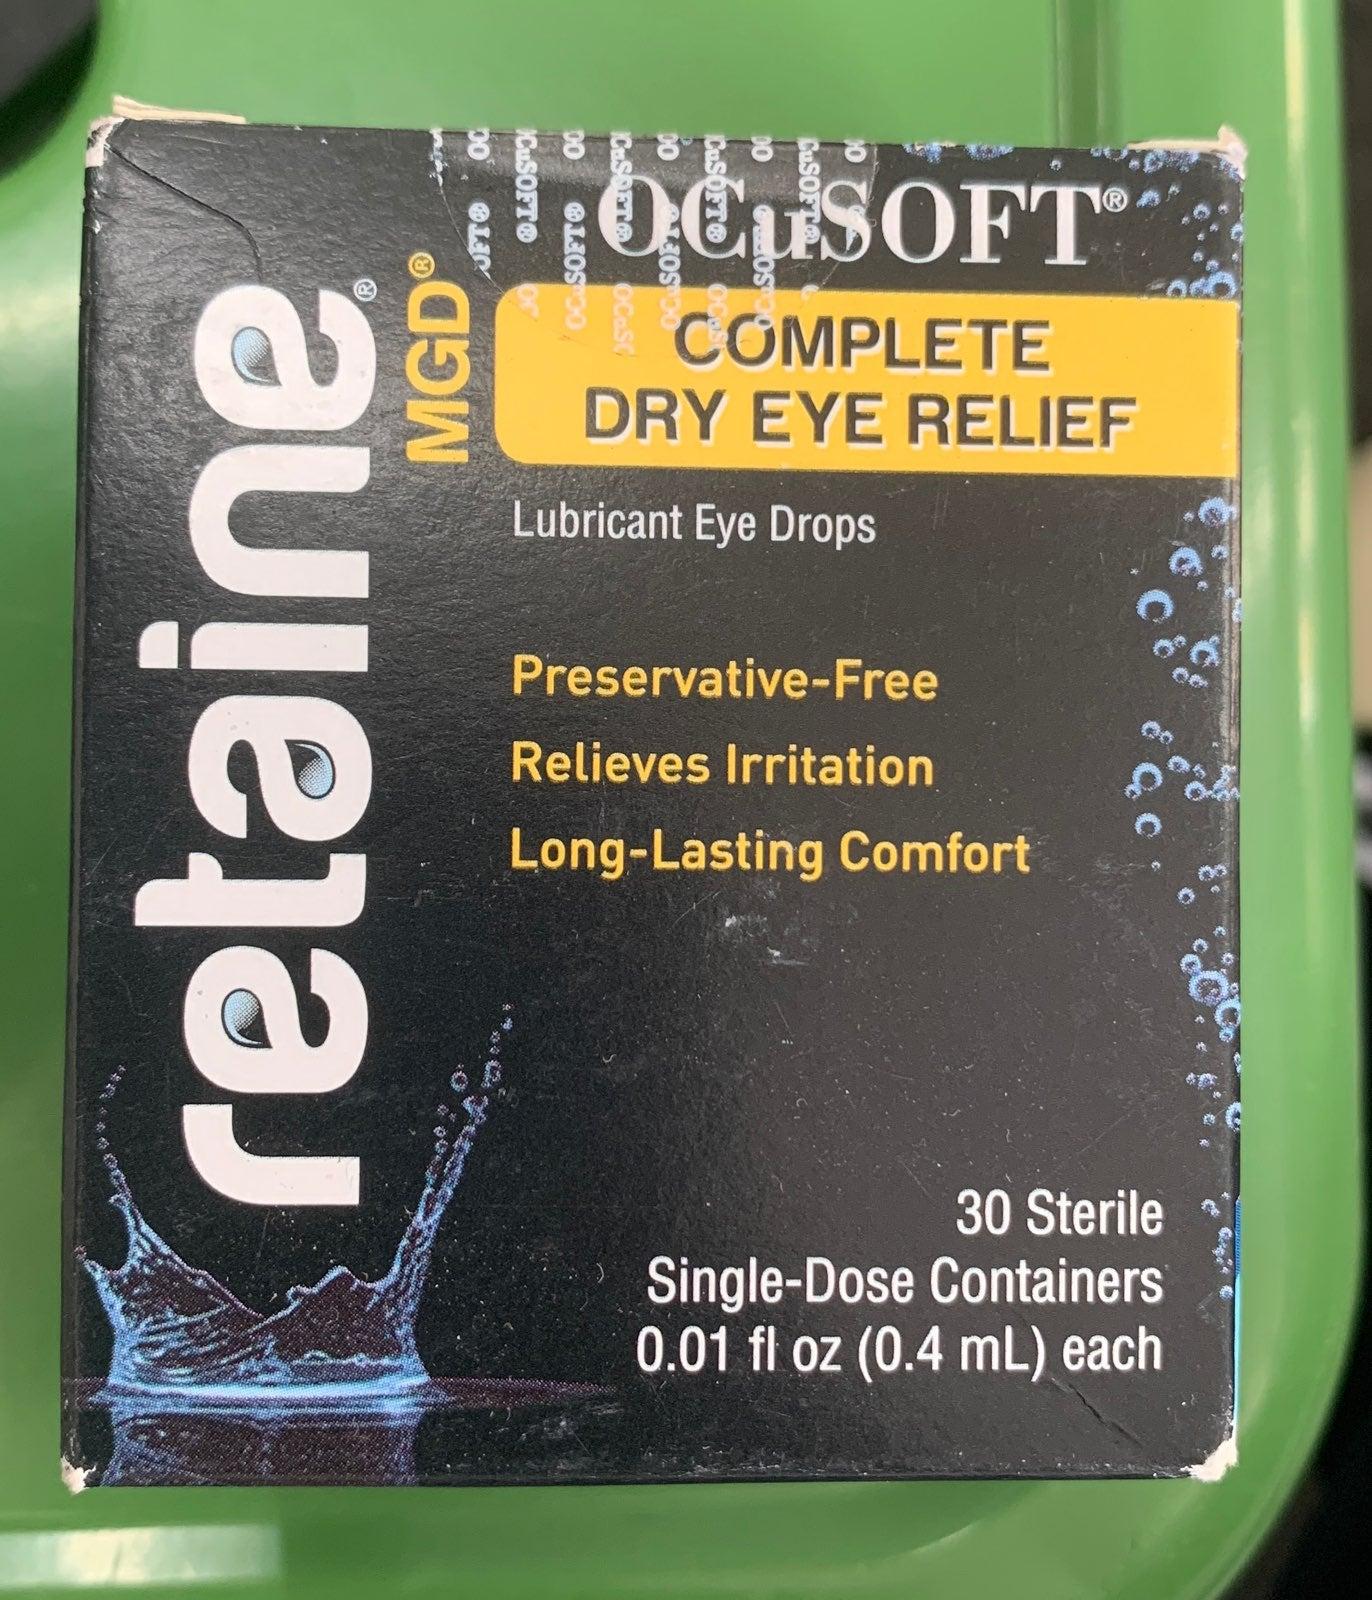 Ocusoft Retaine MGD Dry Eye Relief